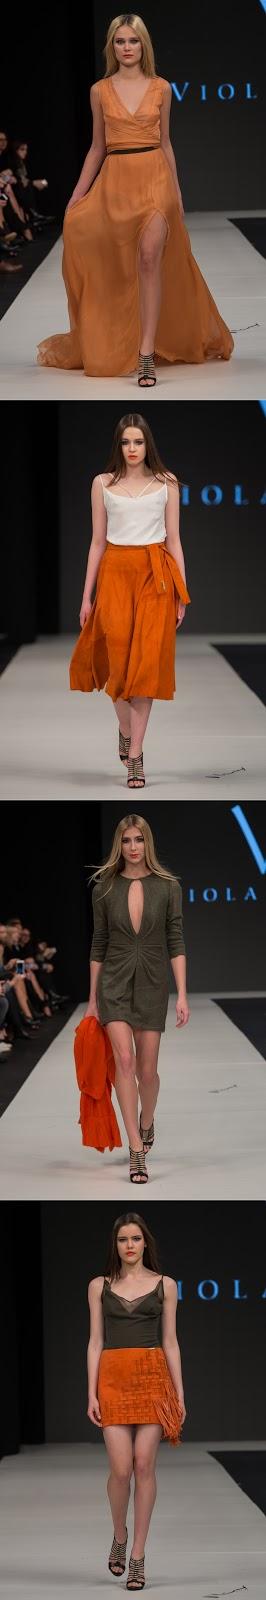 Viola Piekut XIII FashionPhilosophy Fashion Week Poland (c) 2015 Mike Pasarella